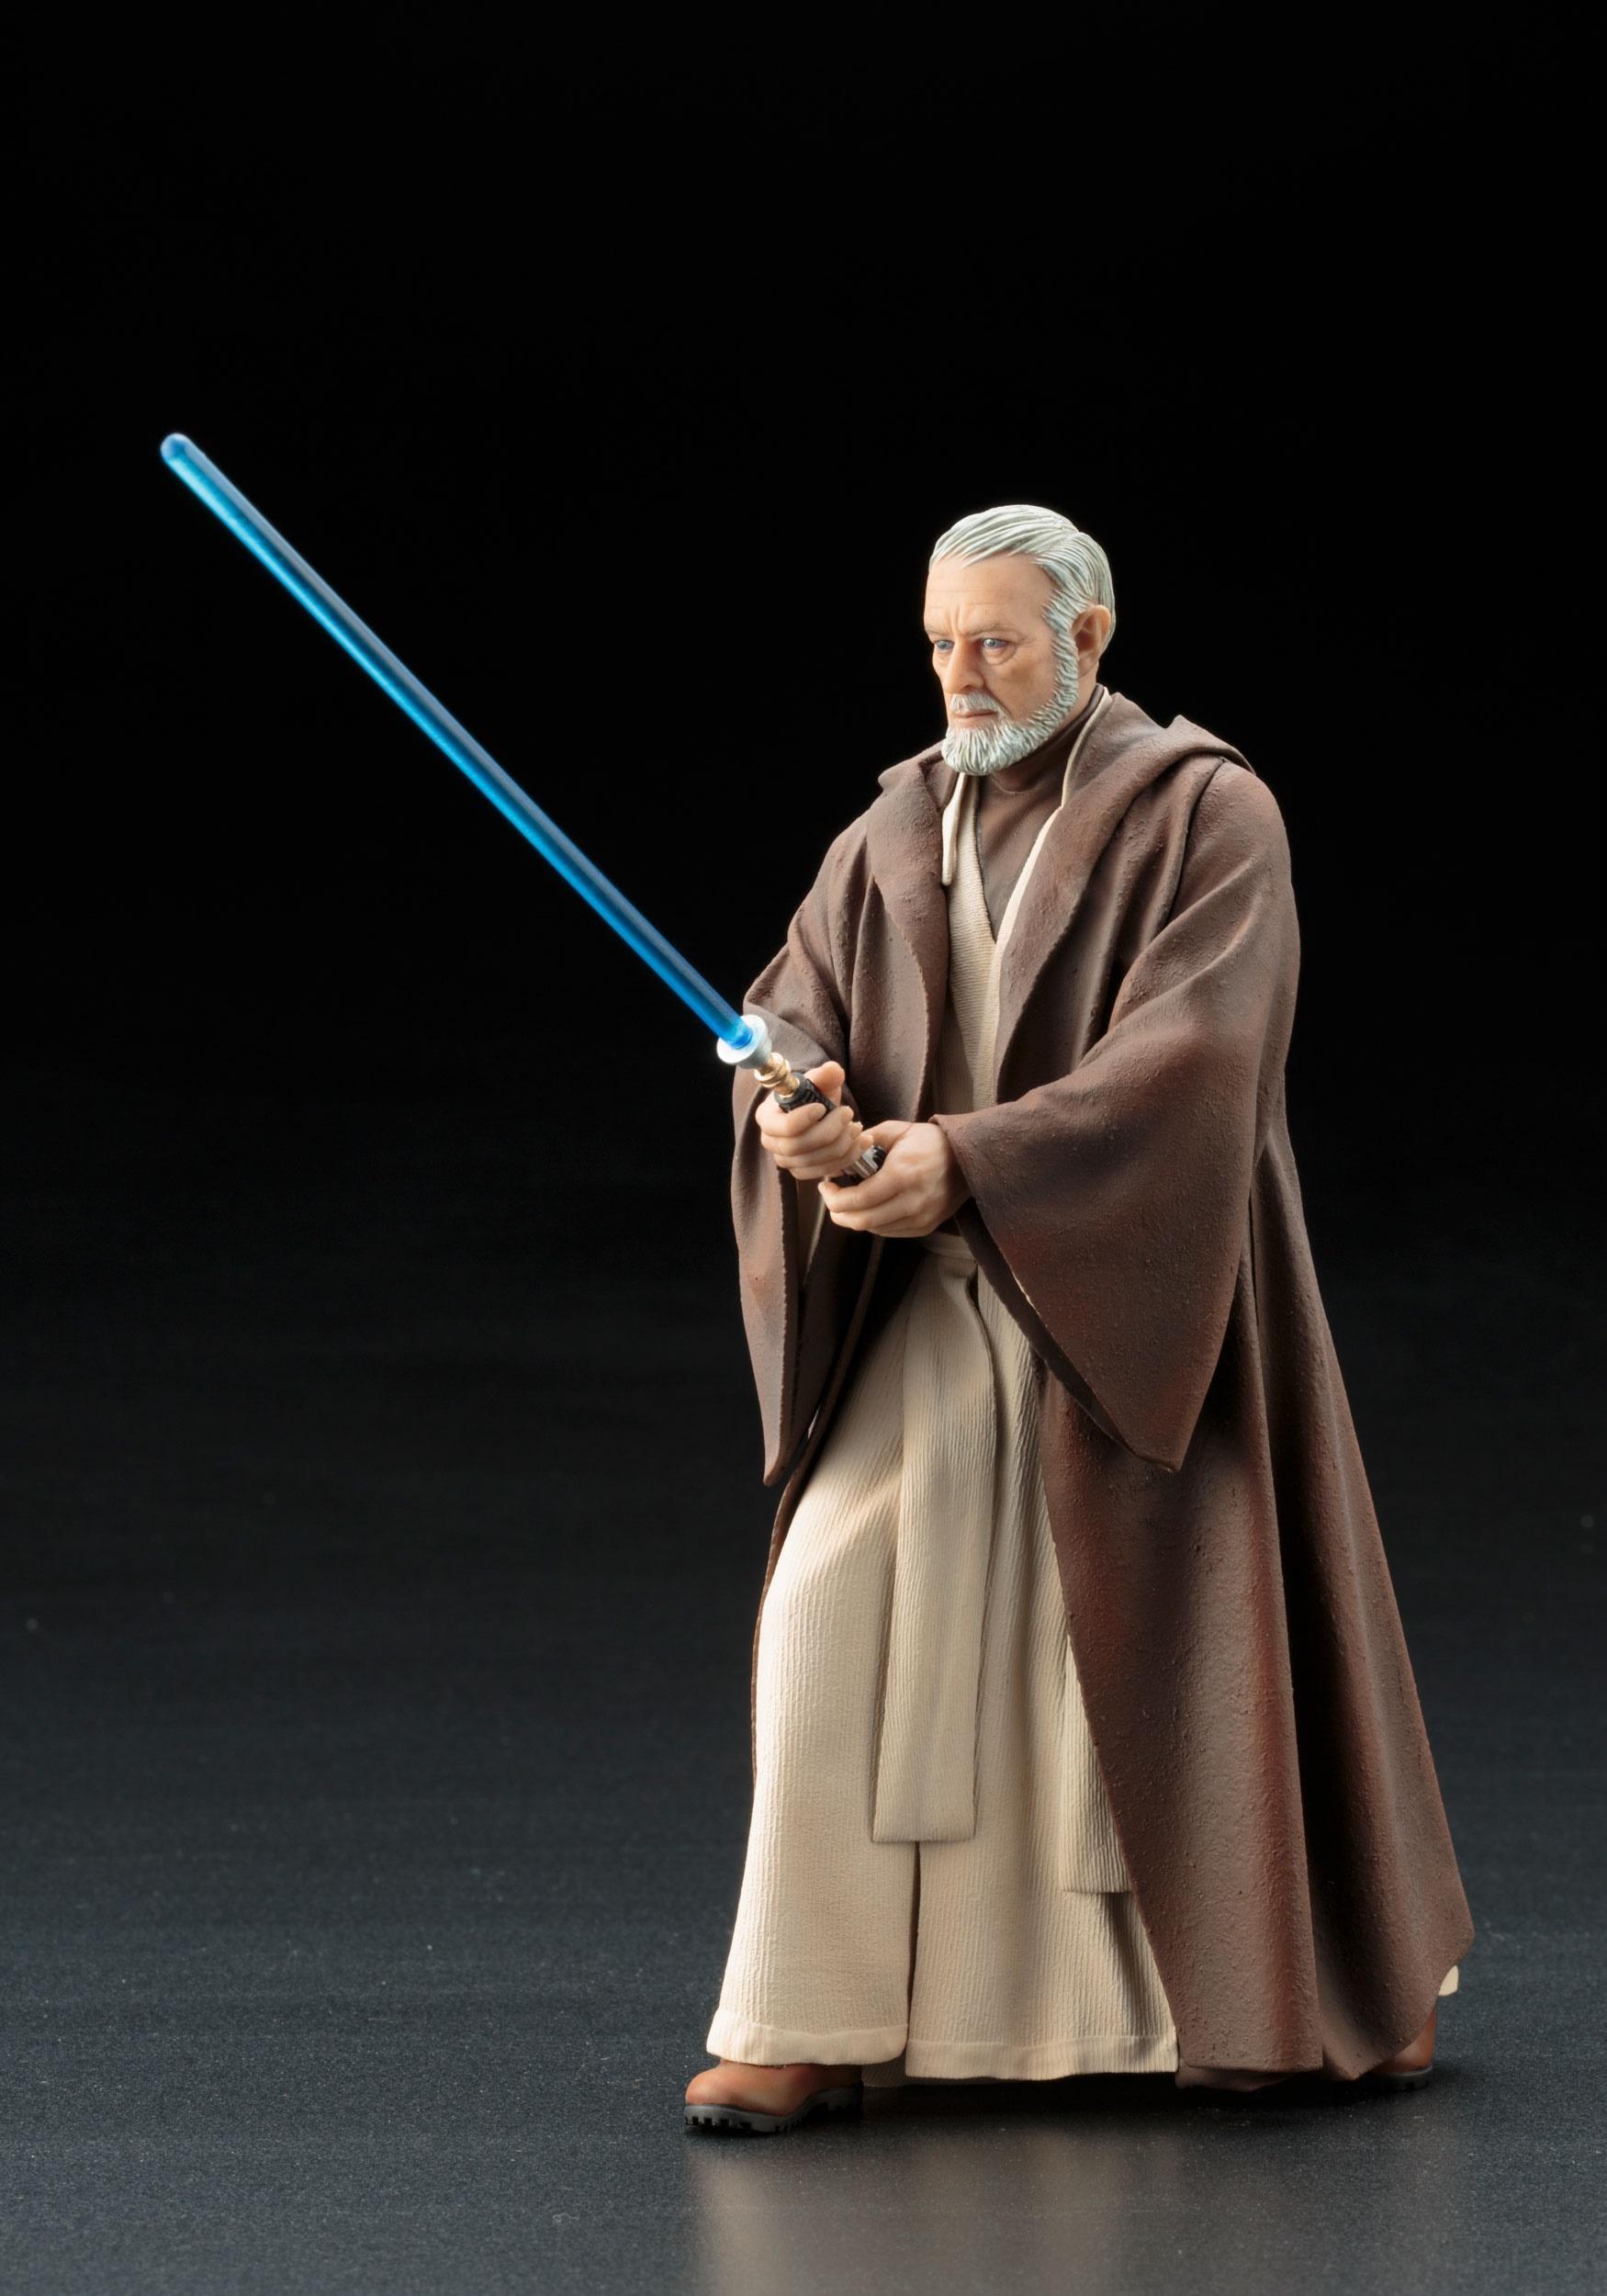 Star Wars Obi-Wan Kenobi ArtFx+ Statue KOSW96